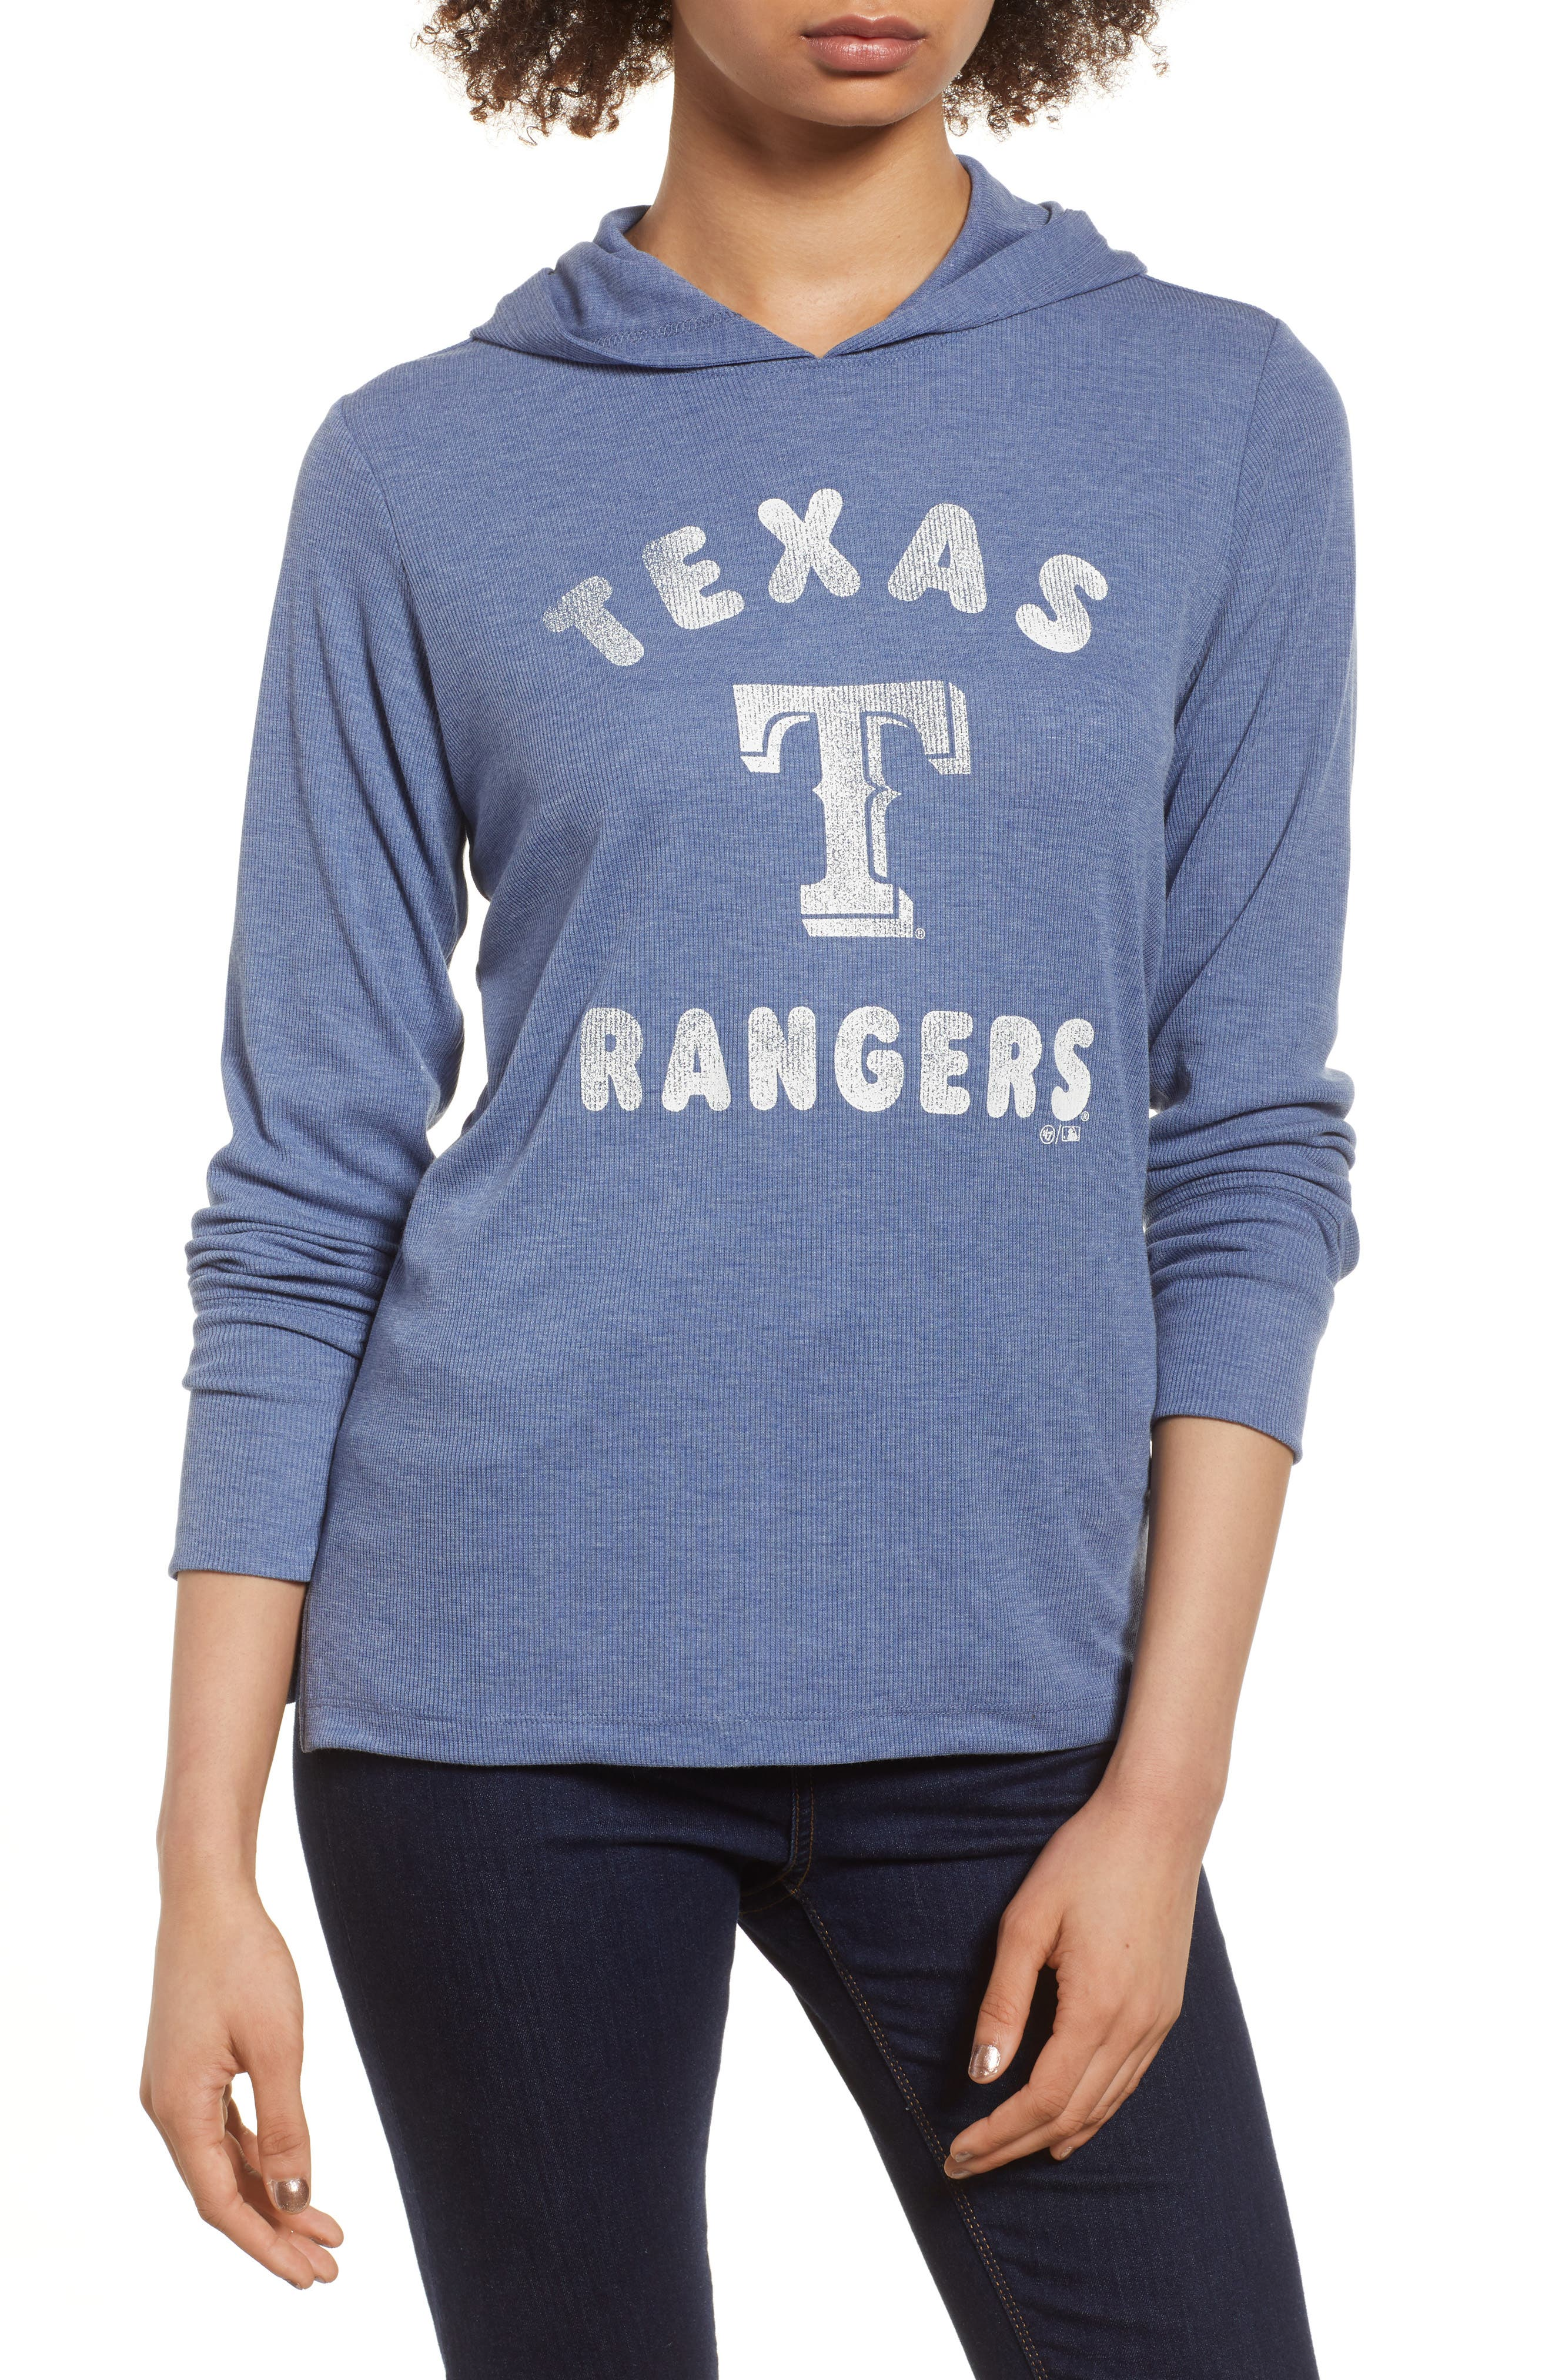 Campbell Texas Rangers Rib Knit Hooded Top,                         Main,                         color, Bleacher Blue